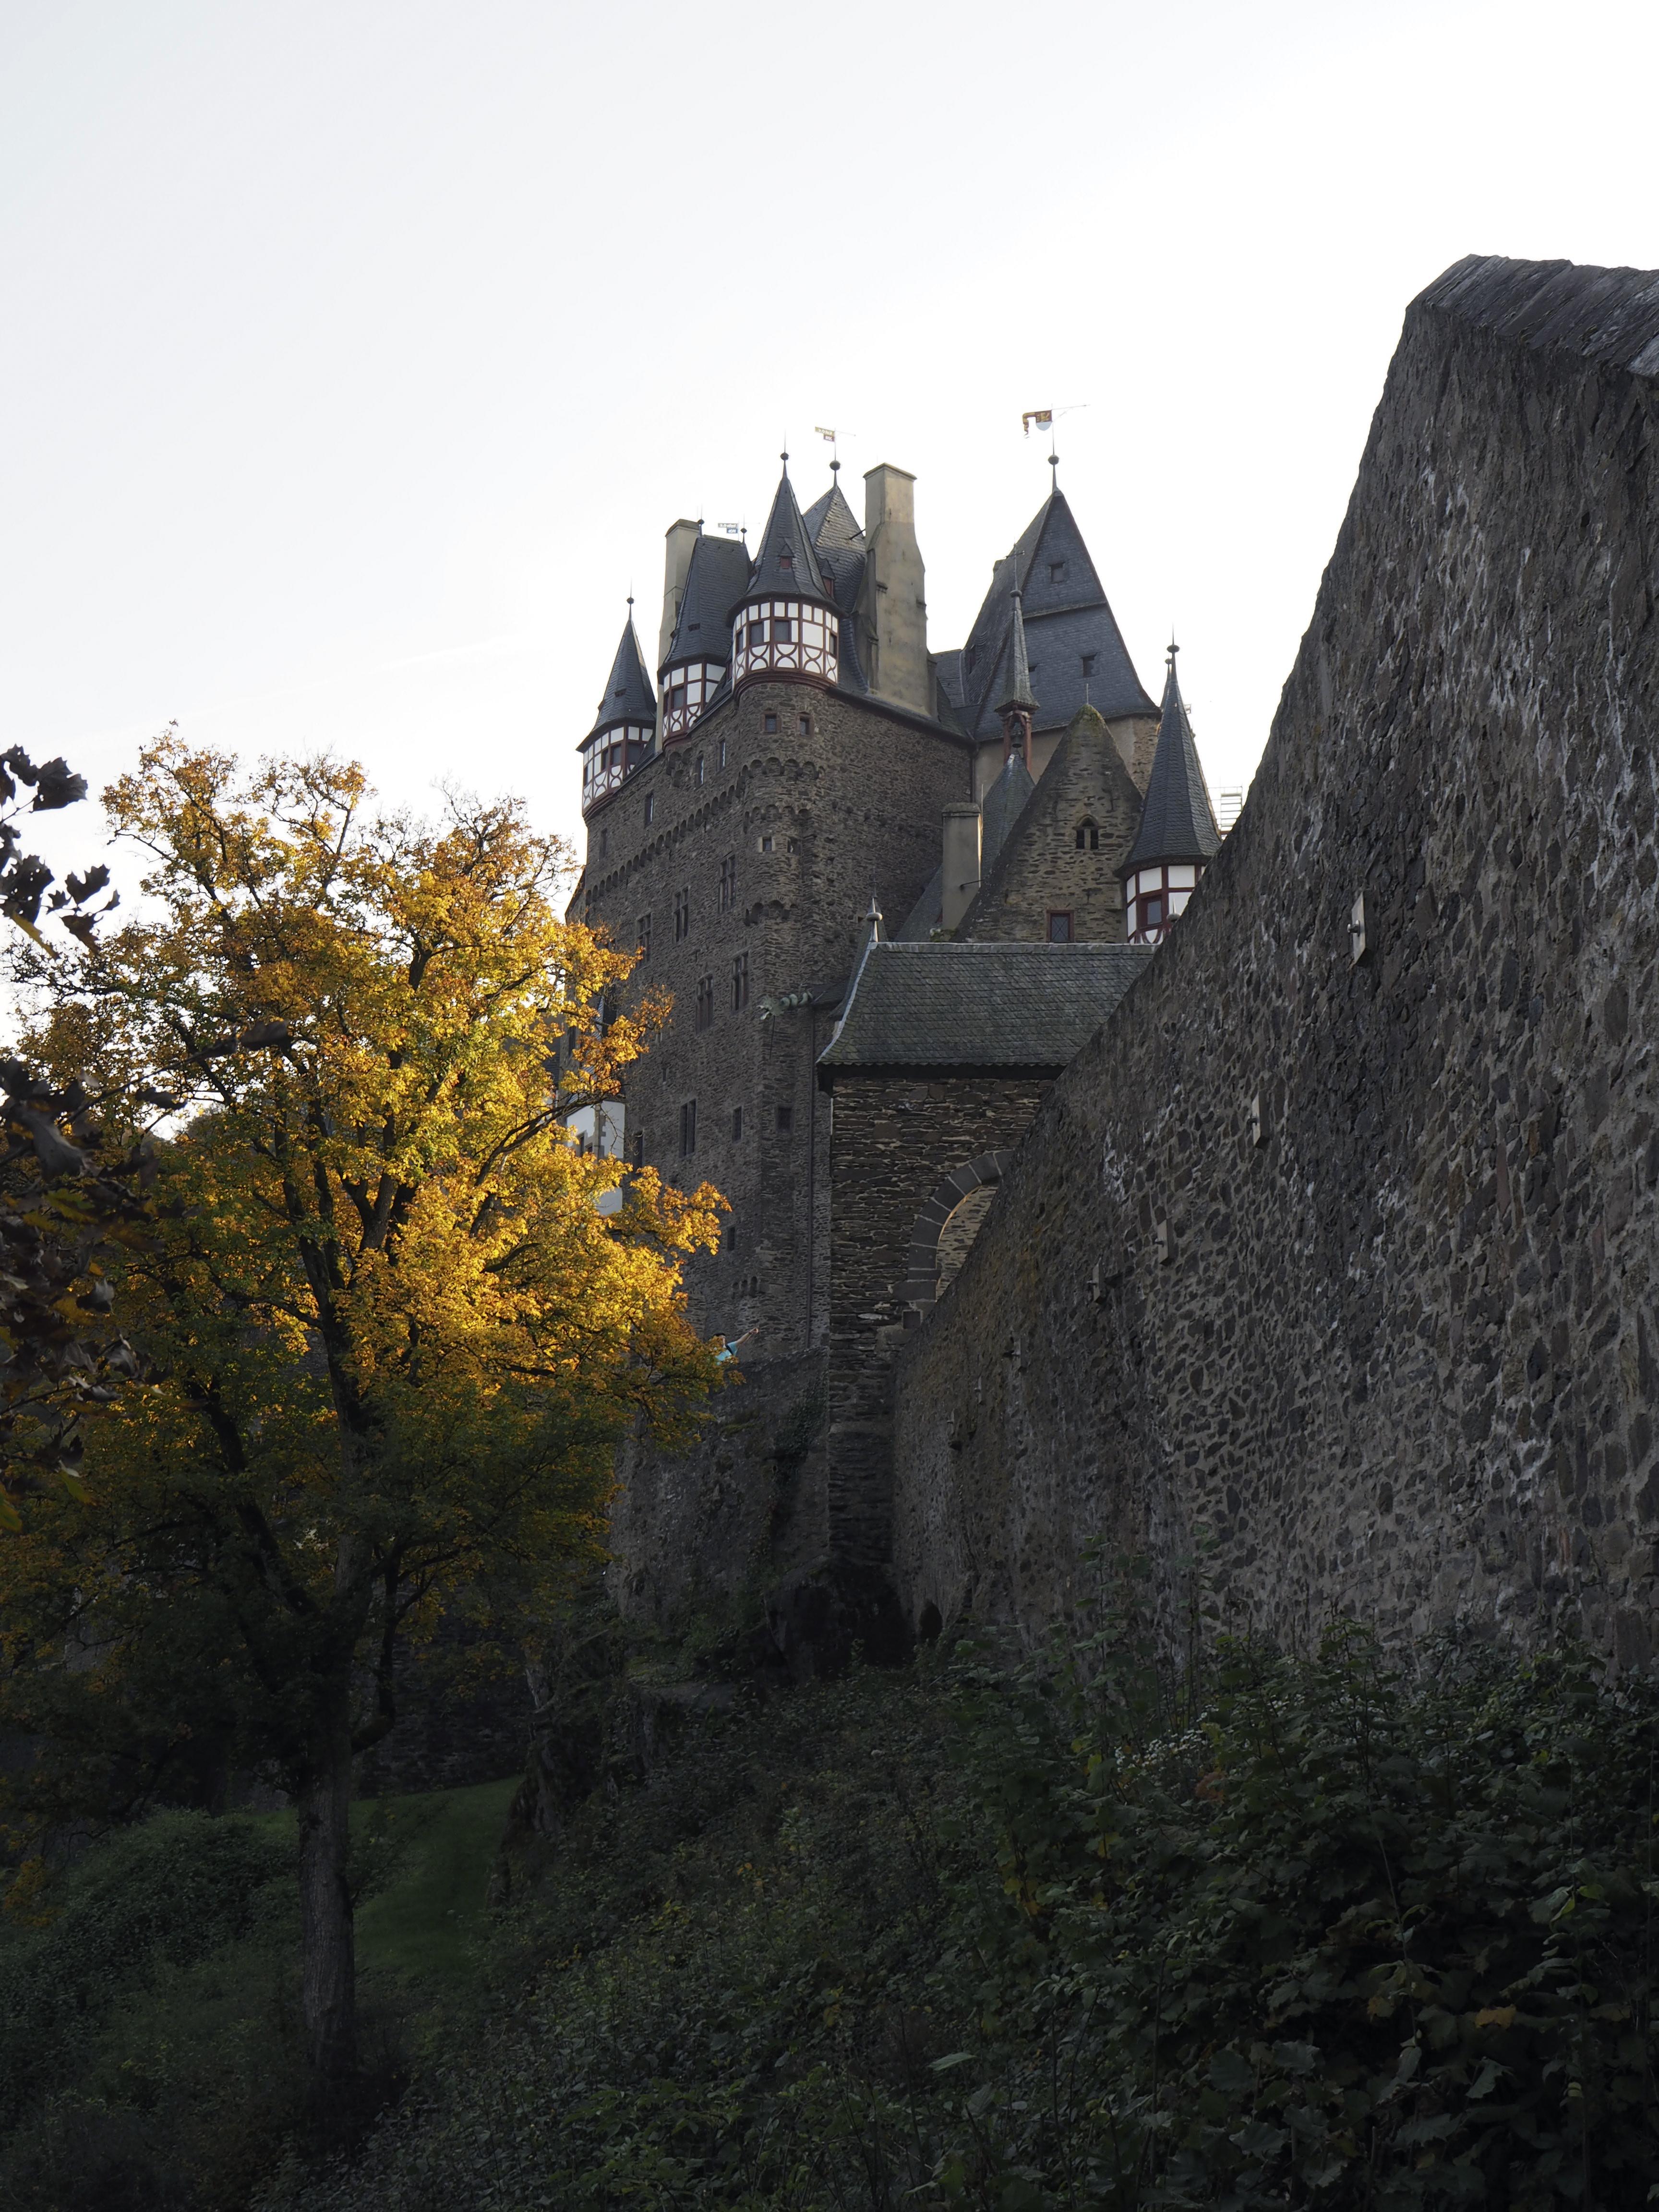 Burg Eltz - Linnalle johtavalta polulta, linnalle saavuttaessa - VAU